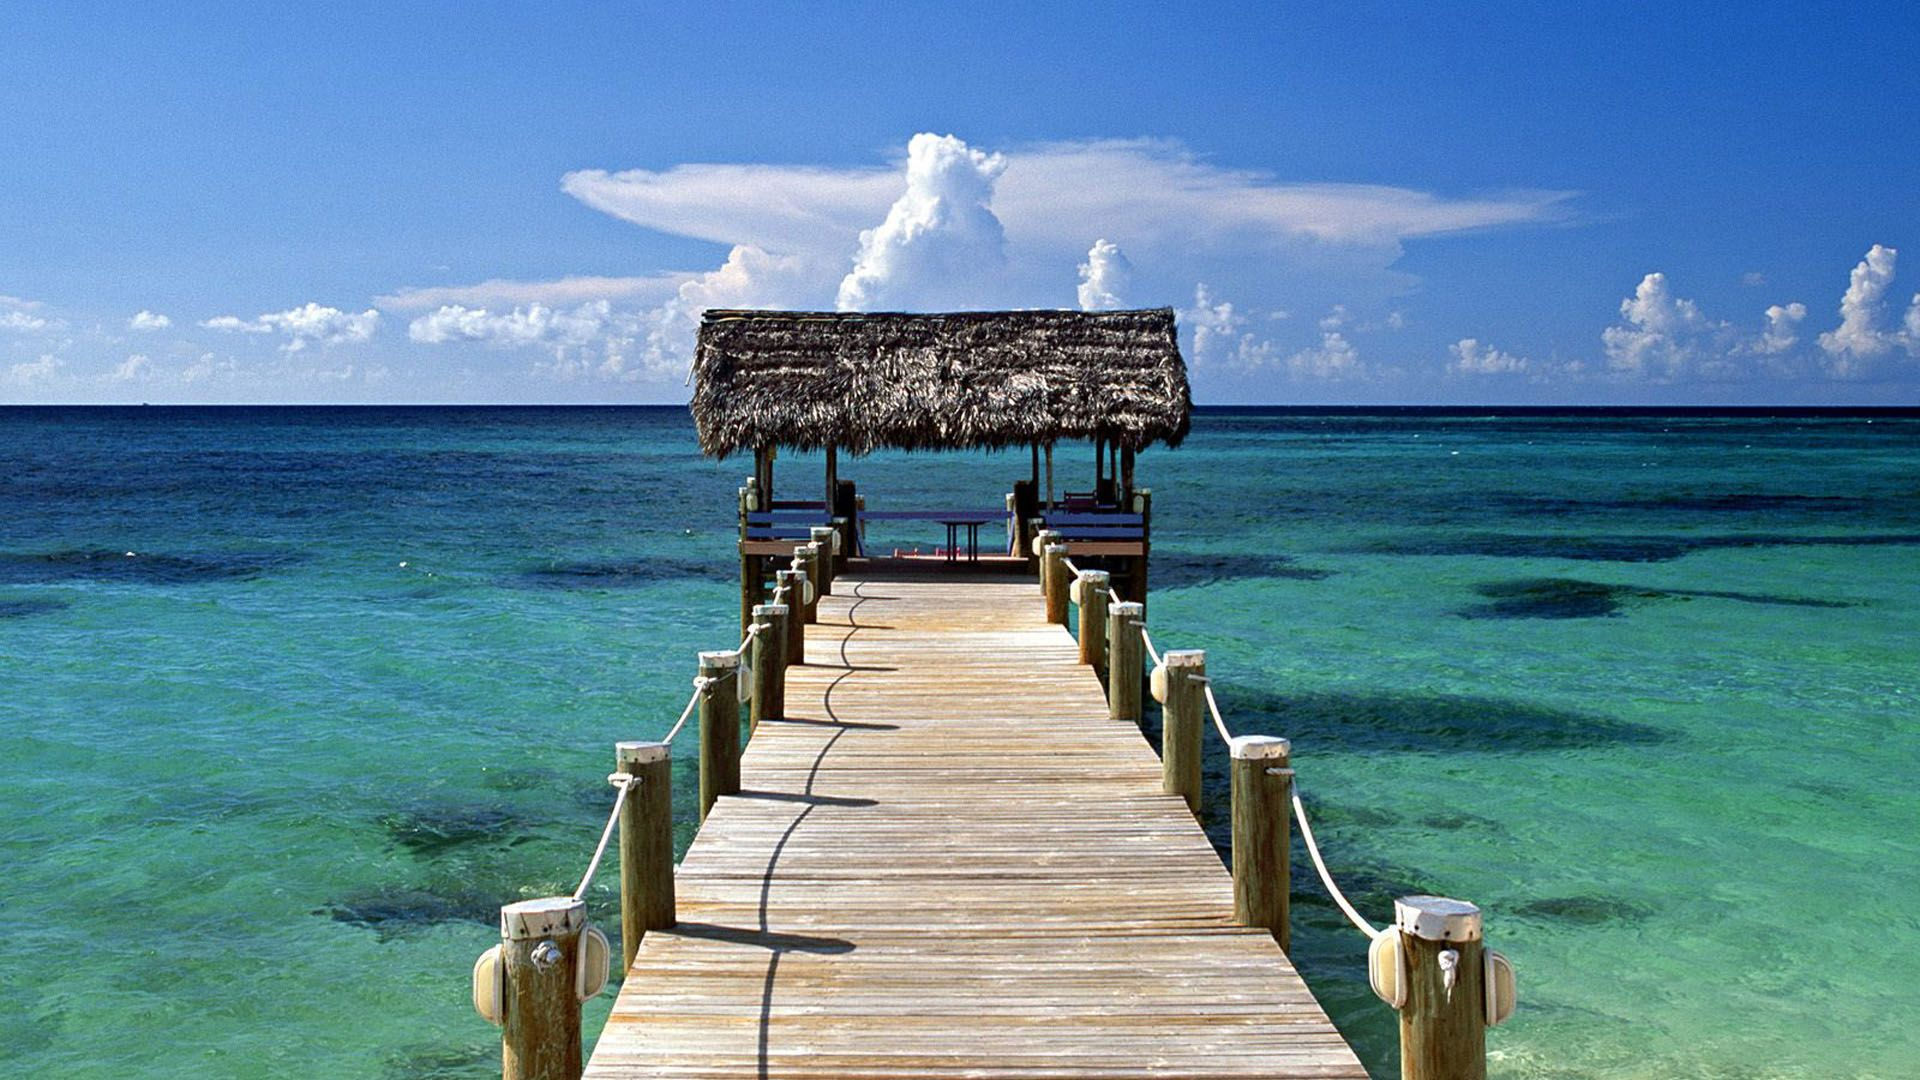 Bahamas desktop background hd